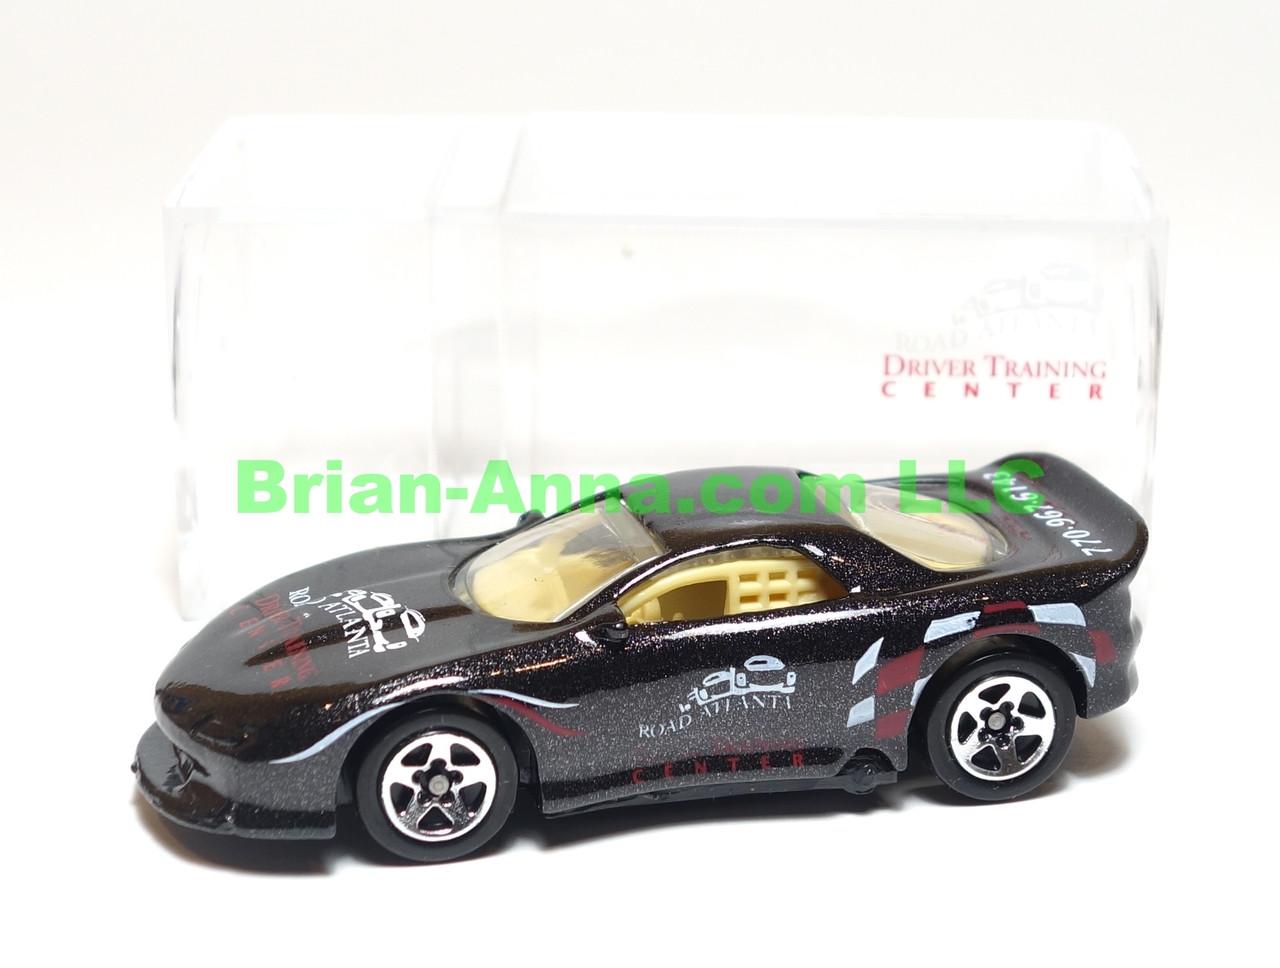 Hot Wheels 93 Camaro in Black, Road Atlanta Raceway Driver Training Center Code 3